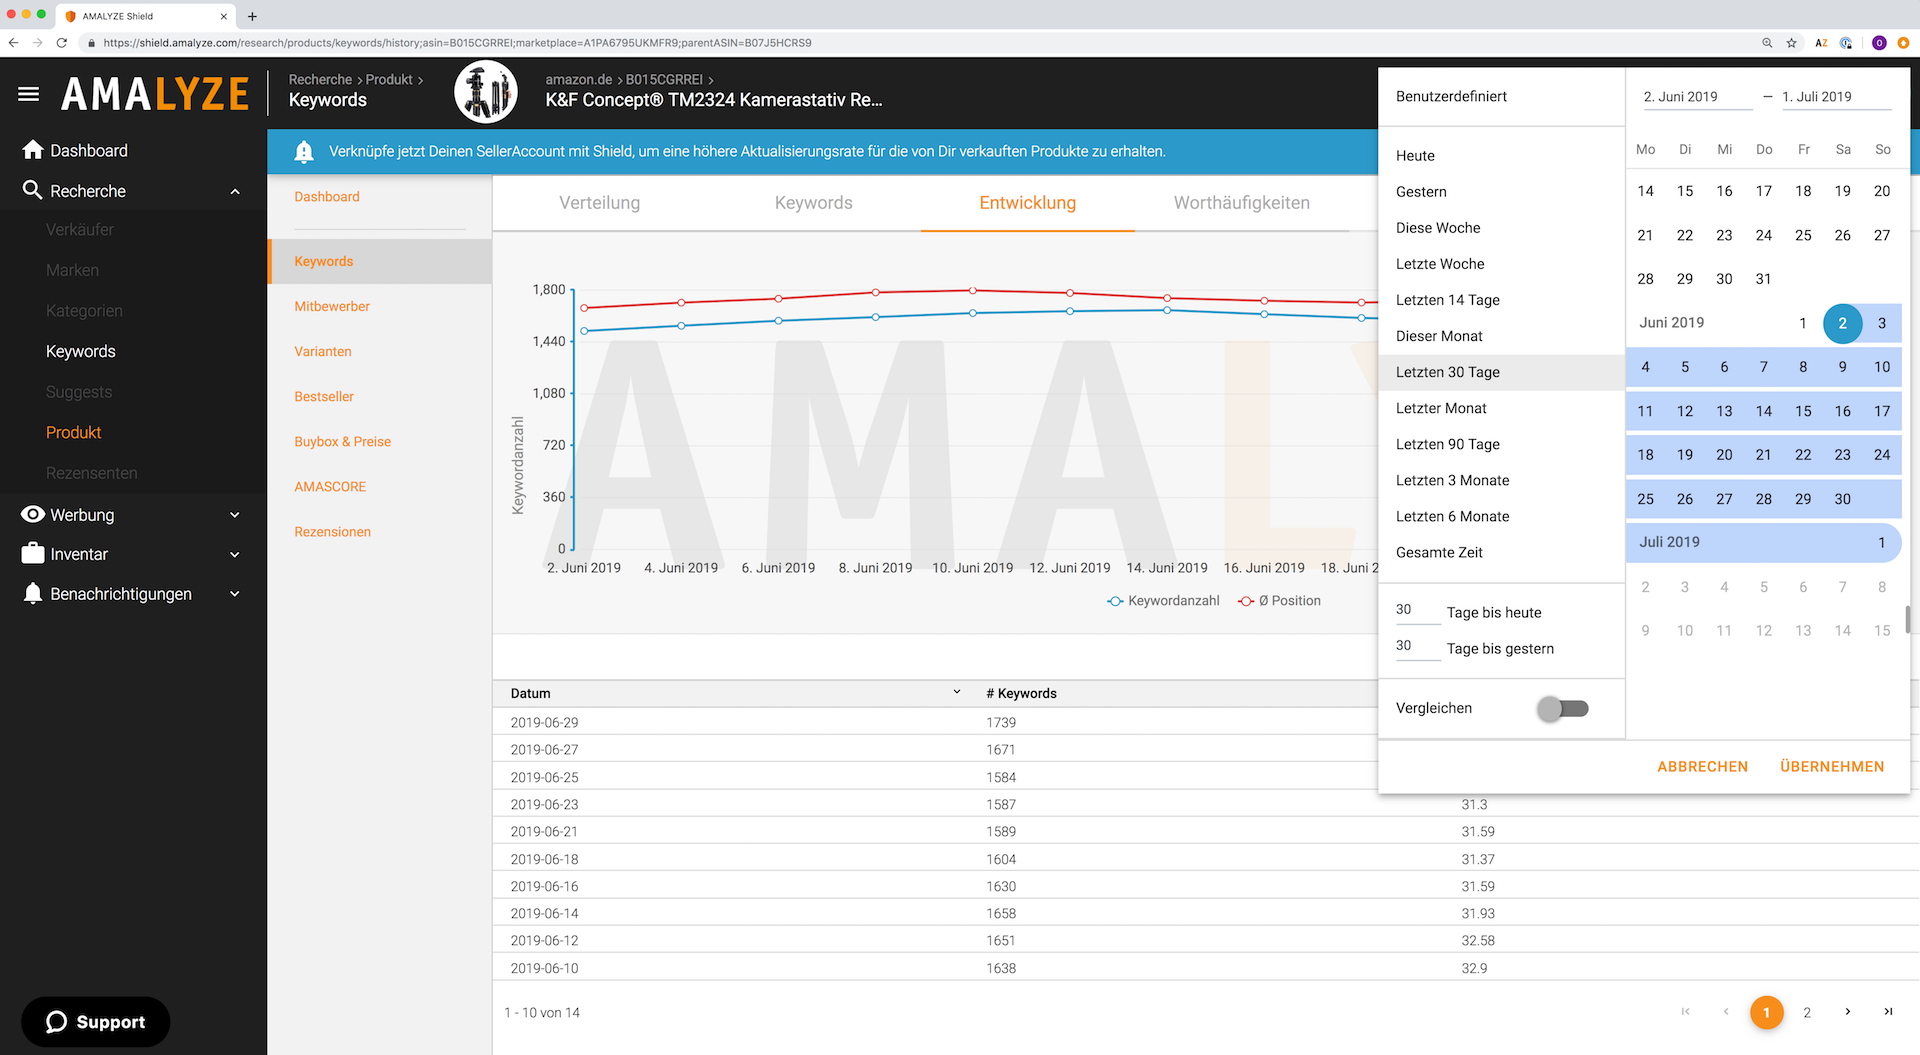 Amazon Keyword Rankings sicht bar machen in AMALYZE Shield